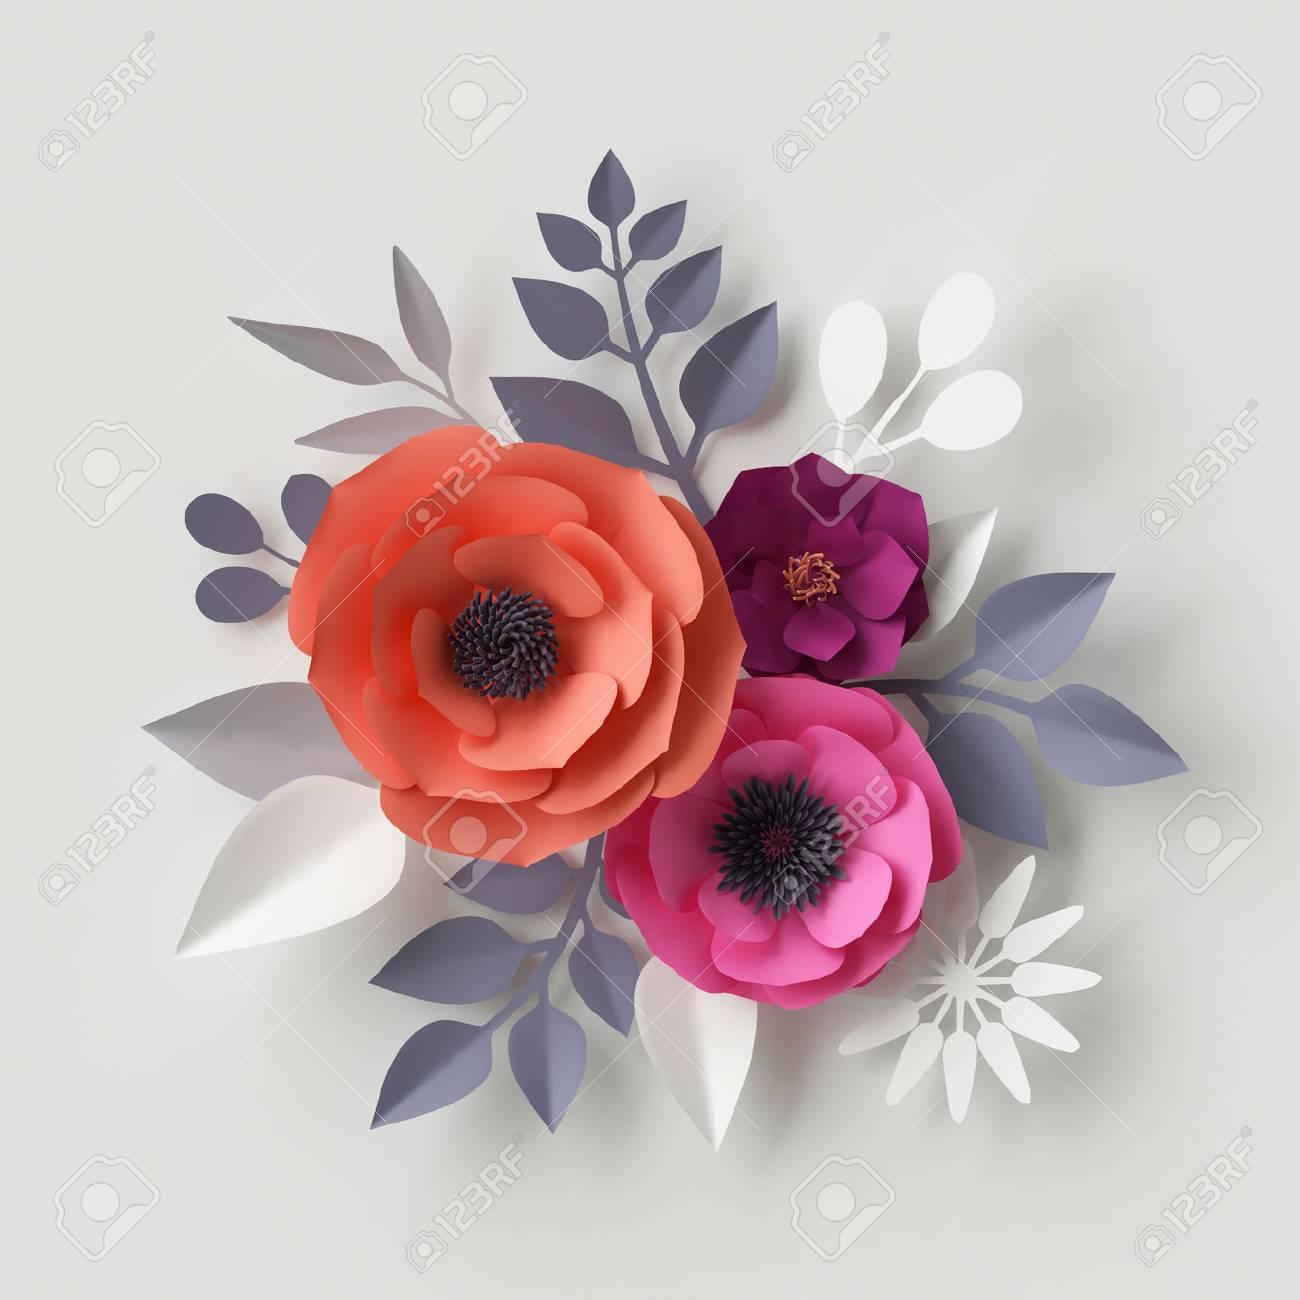 3d render digital illustration red pink paper flowers floral 3d render digital illustration red pink paper flowers floral background wedding card mightylinksfo